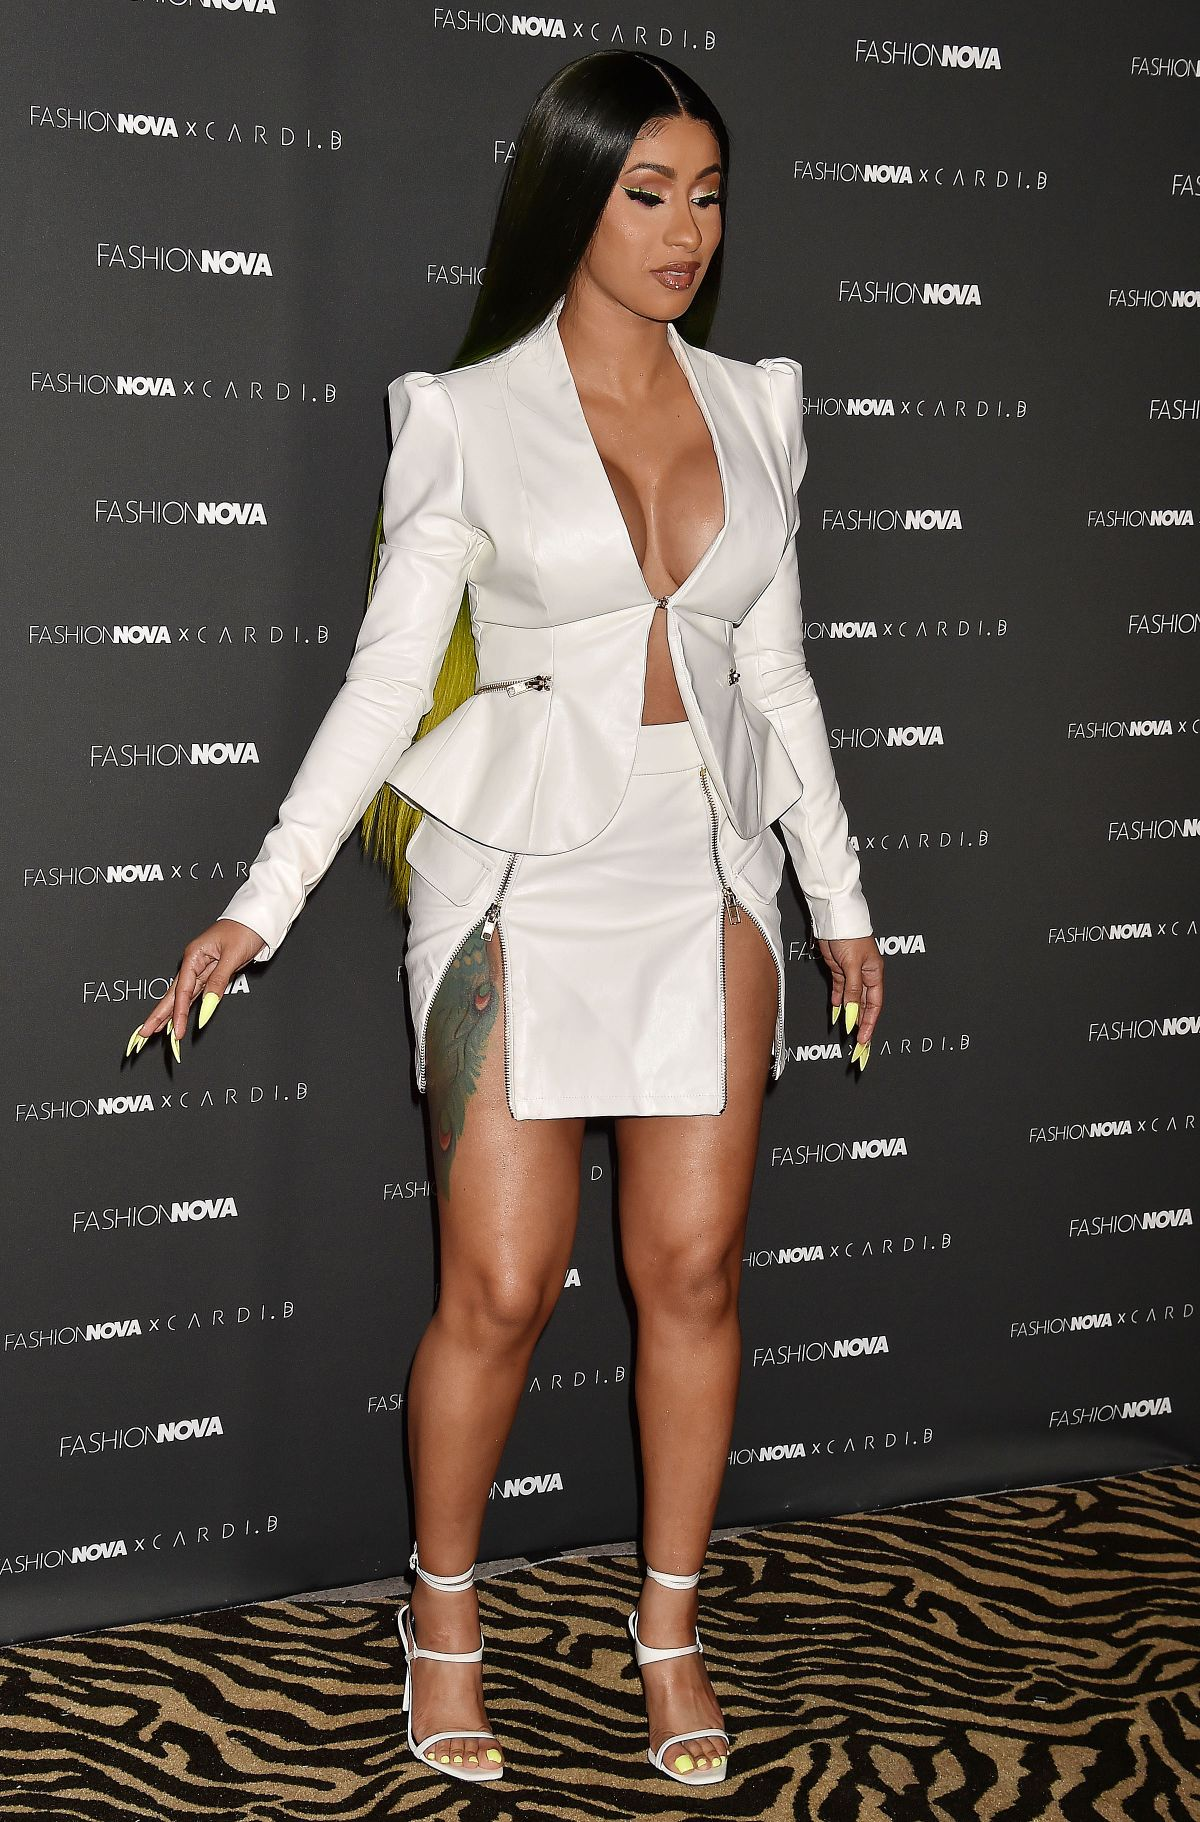 Cardi B Outfits: CARDI B At Fashion Nova X Cardi B Collection Launch At